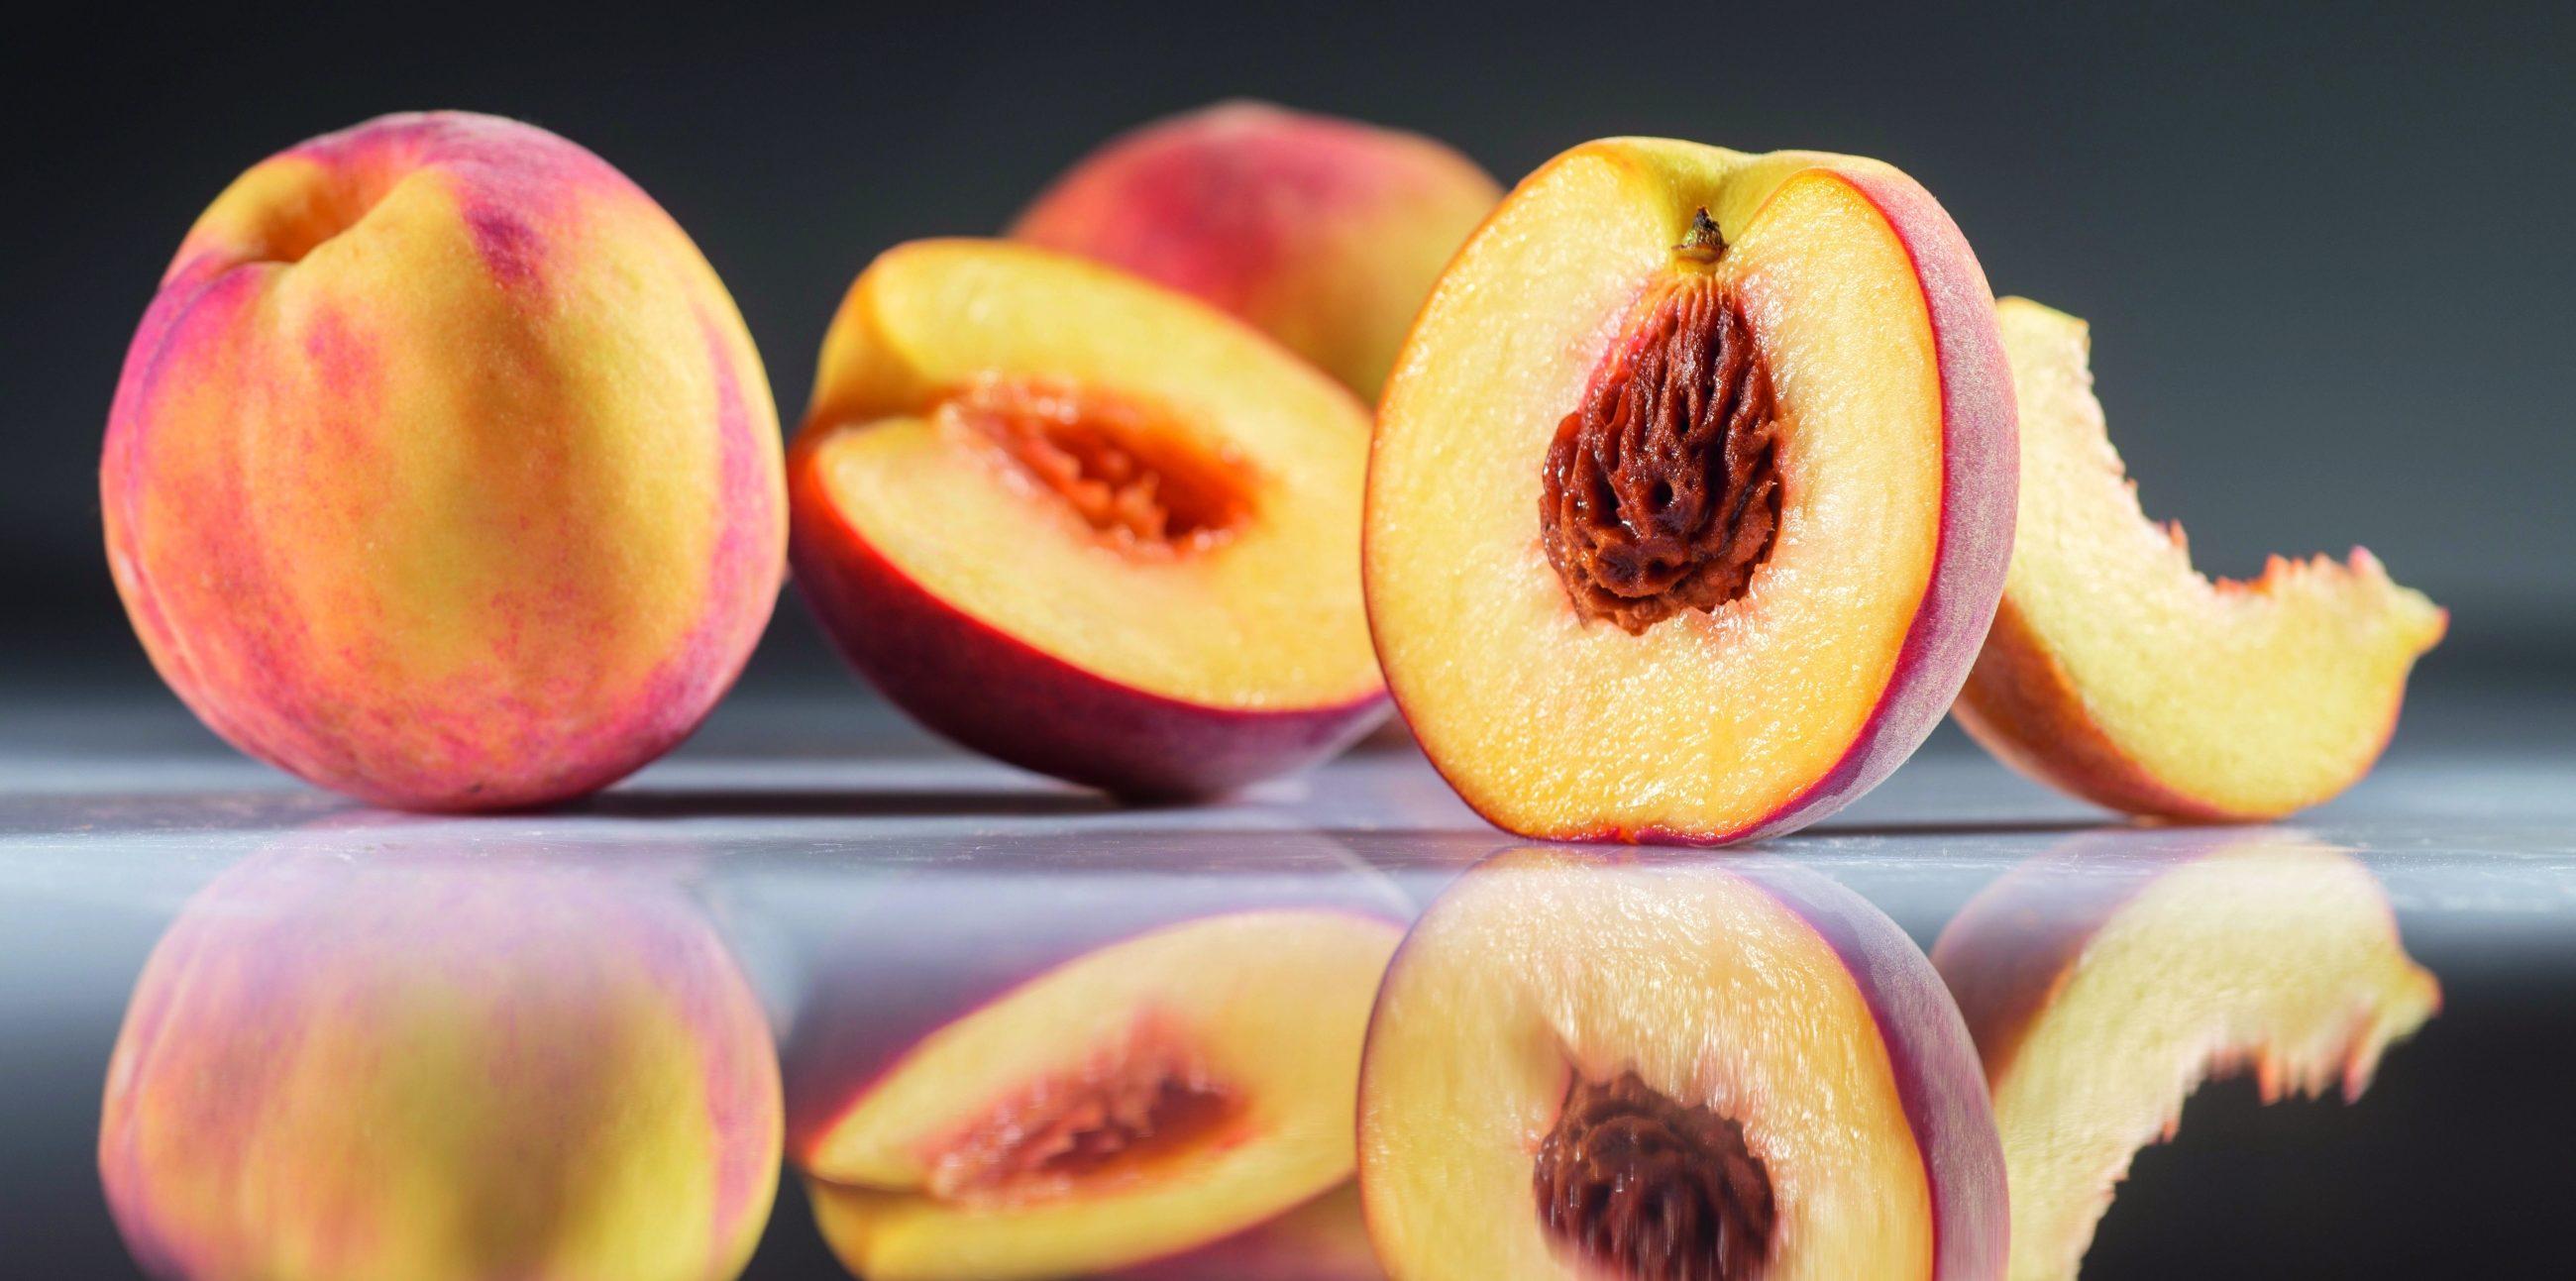 Pfirsich - Duft des Sommers1